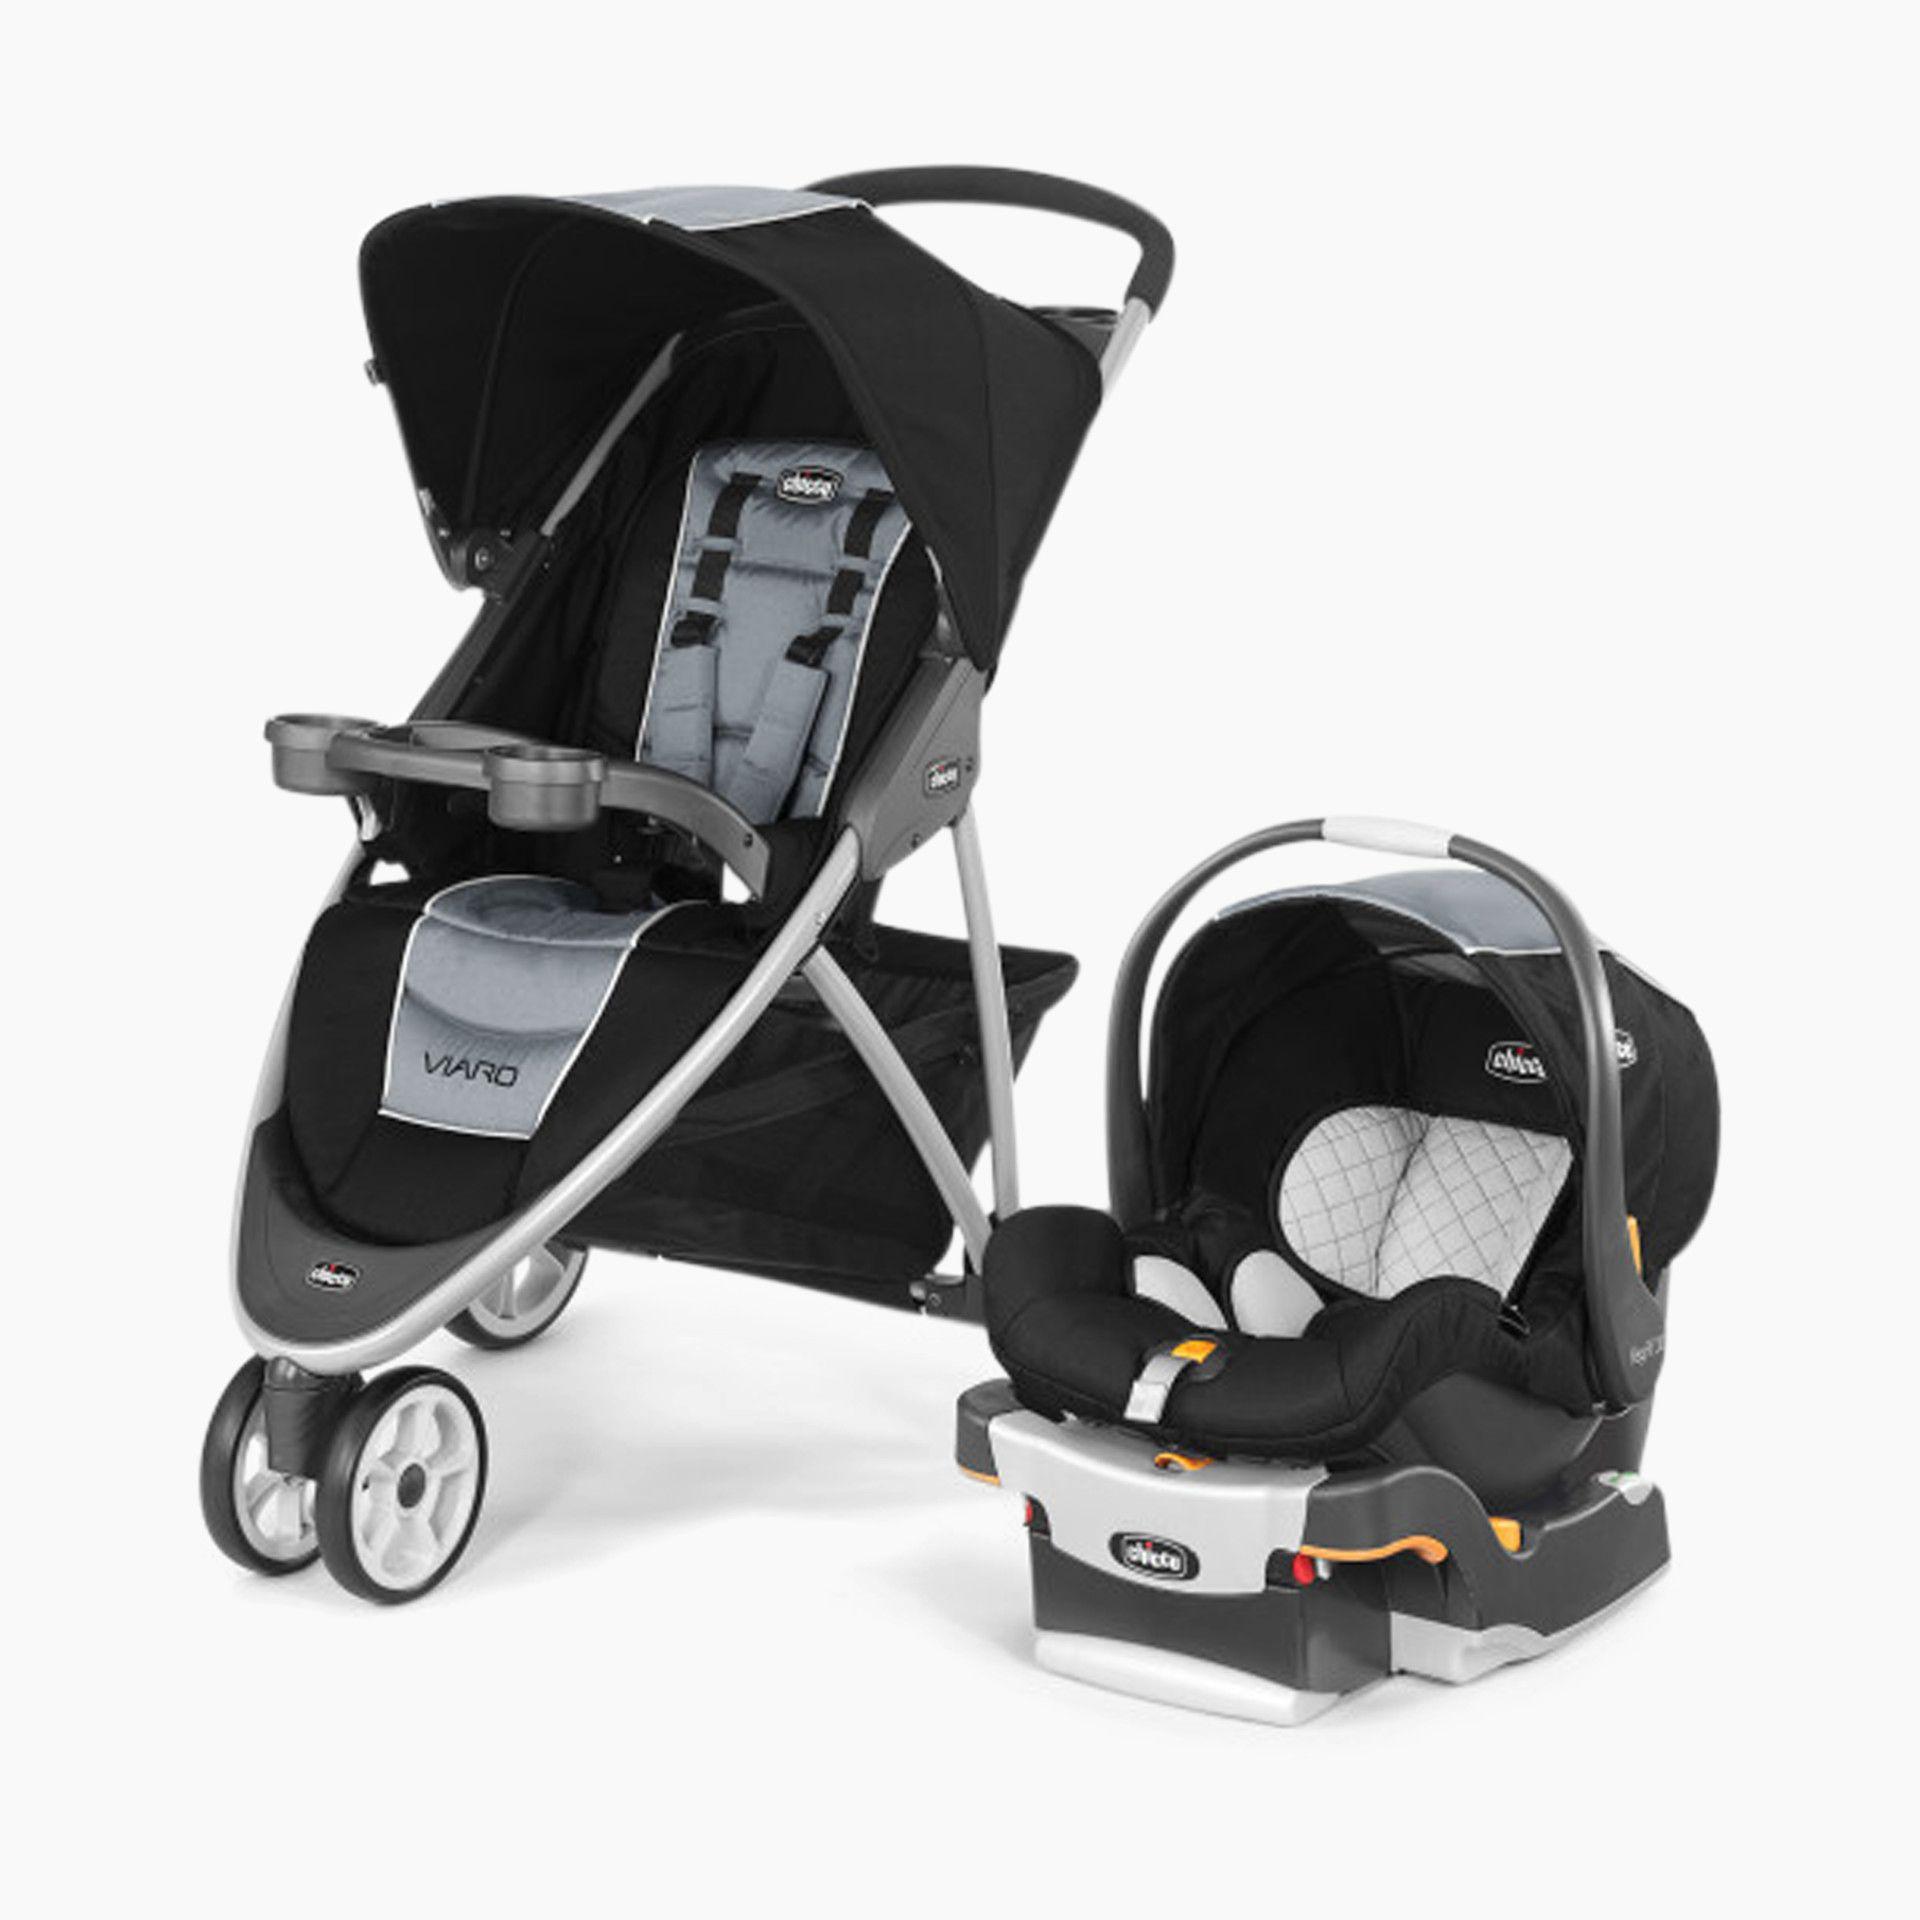 27+ Chicco bravo stroller travel system ideas